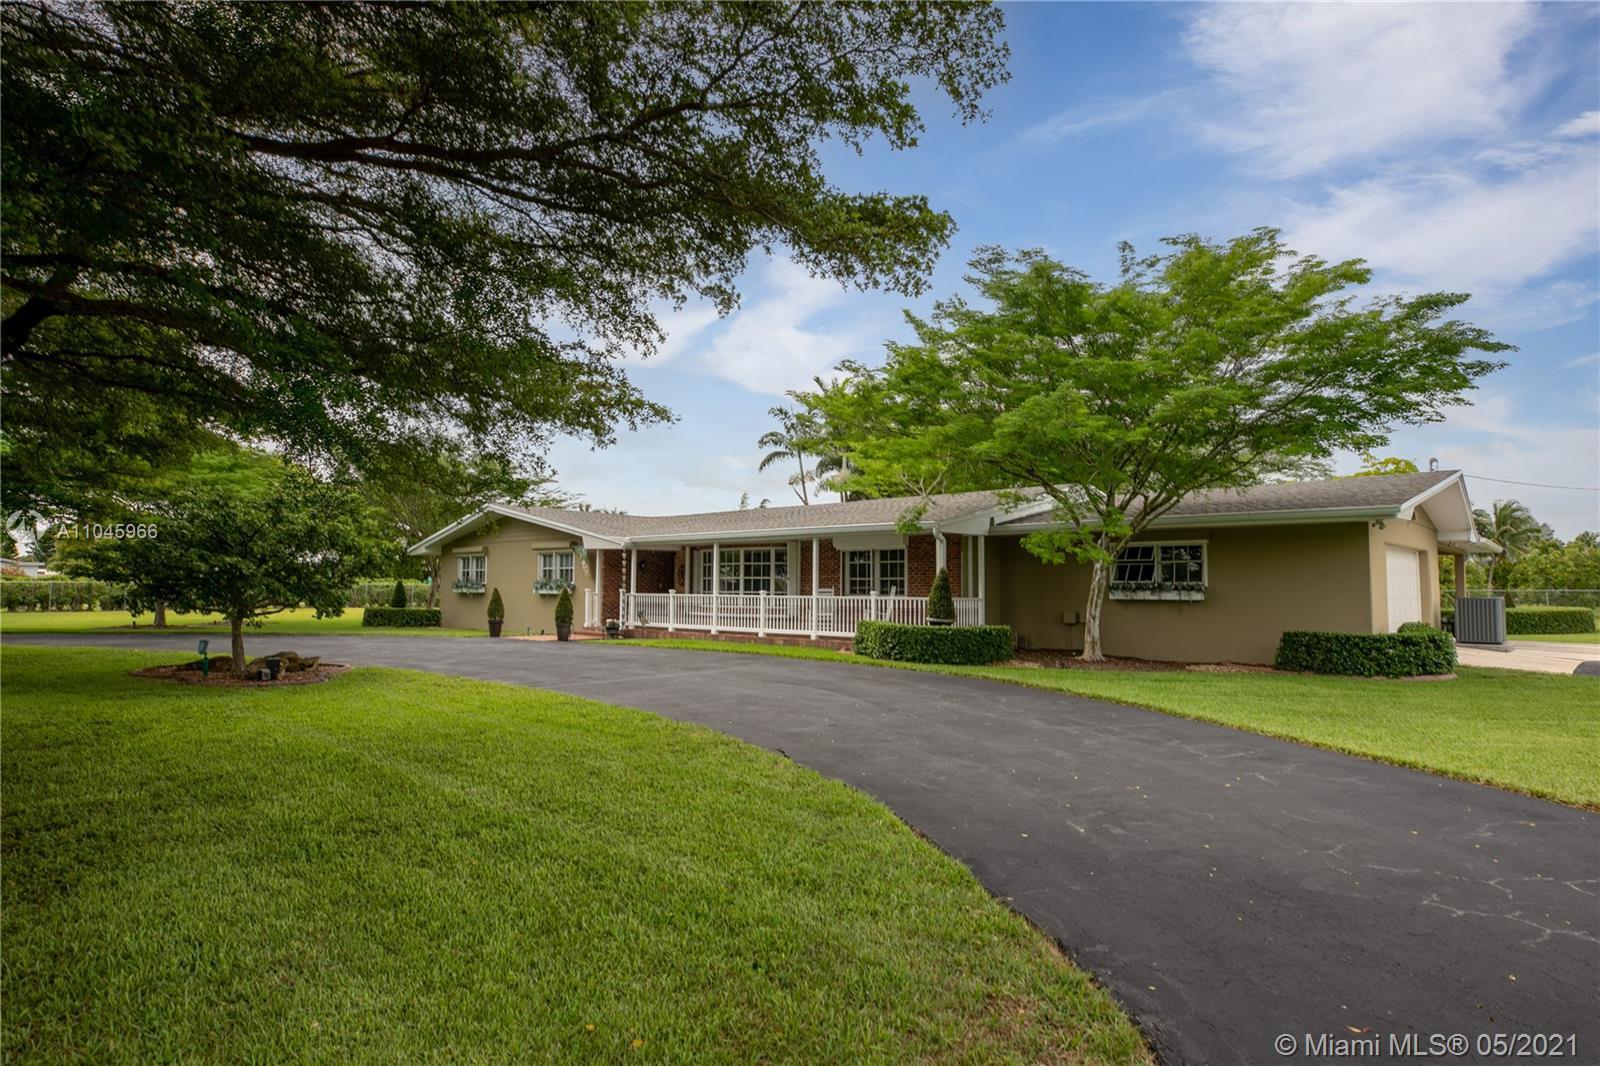 19000 Sw 312th St Property Photo 1